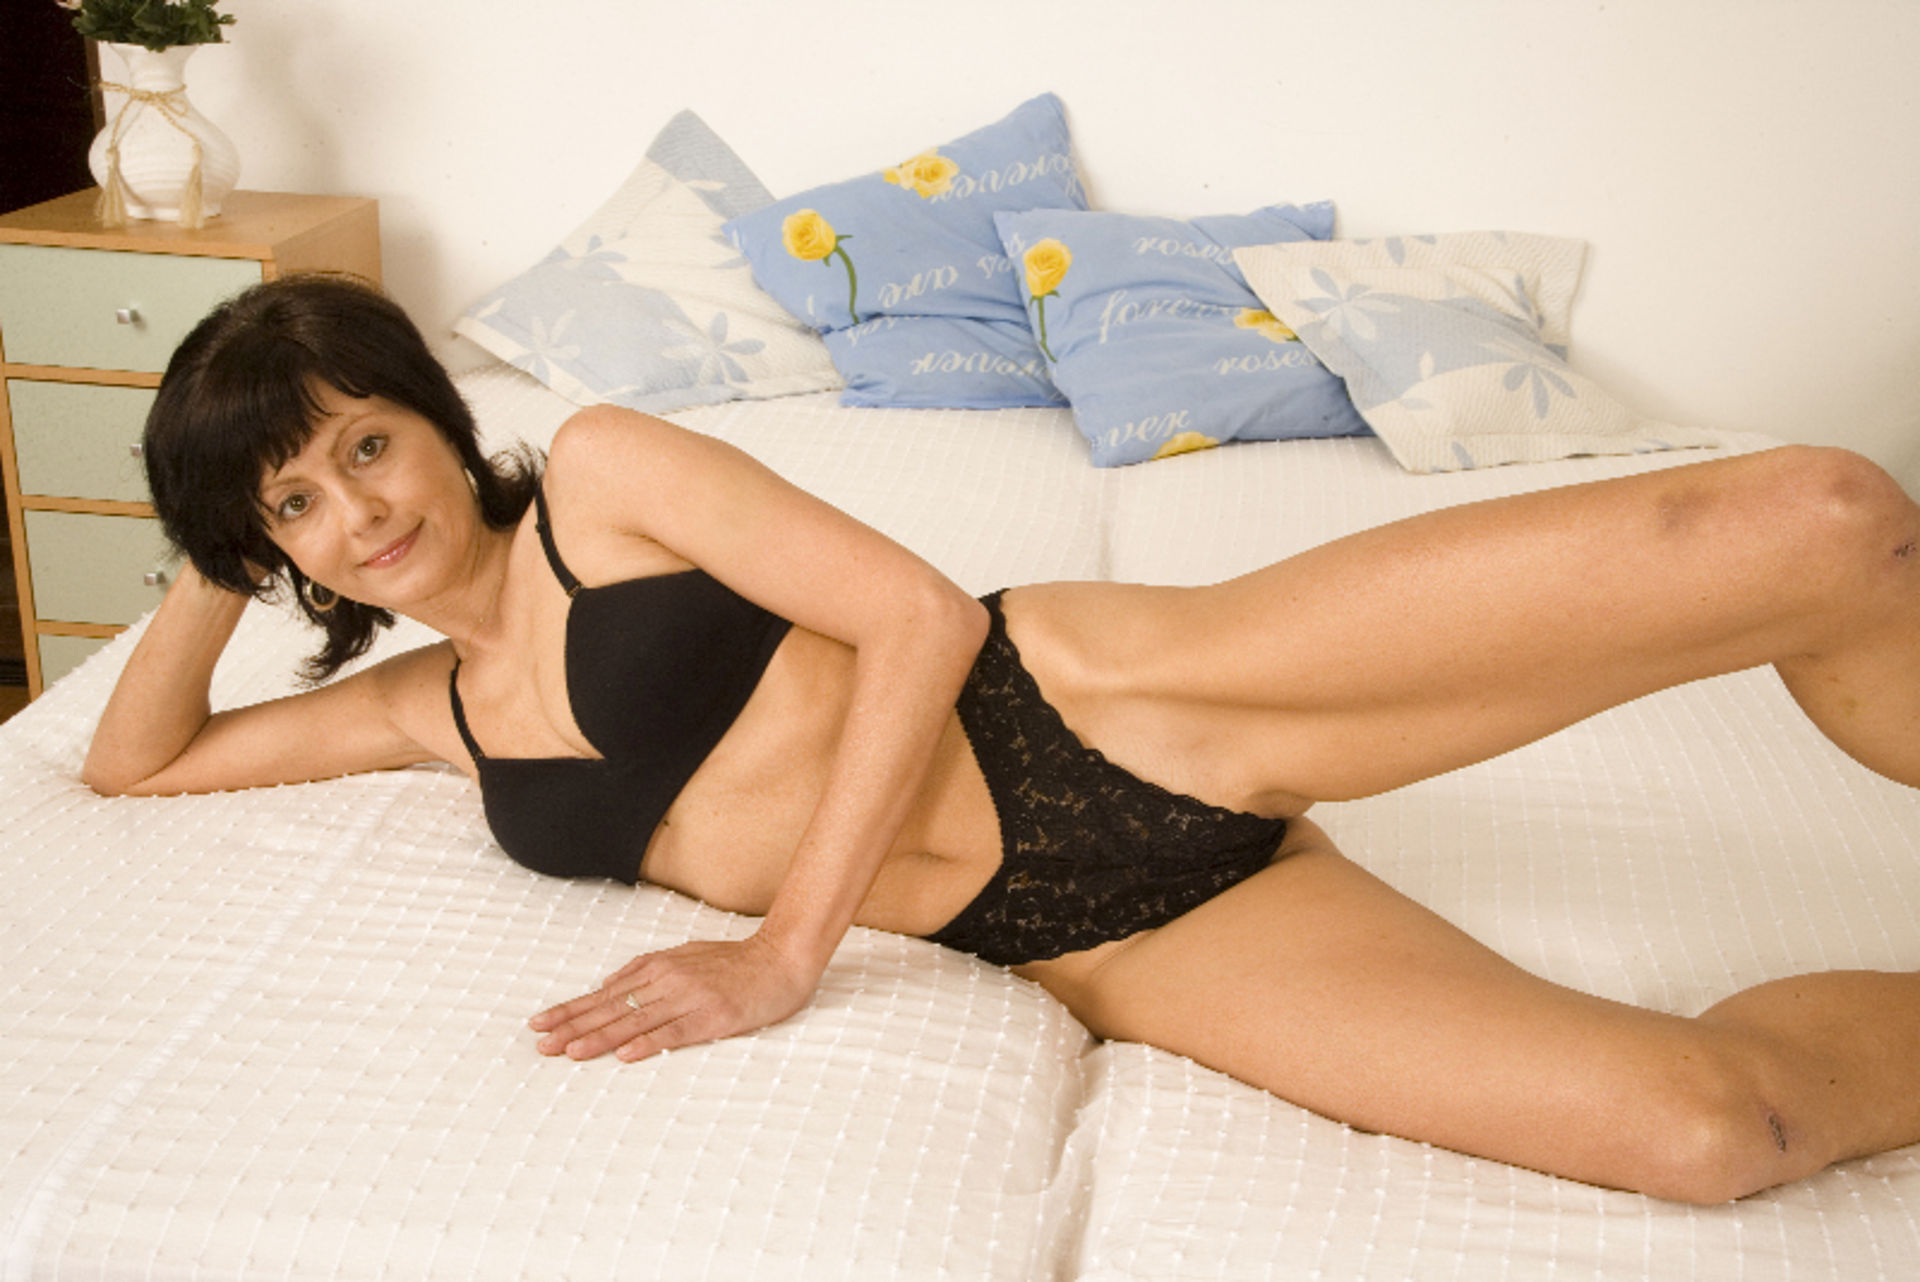 Porn star girls puffy nipples stills